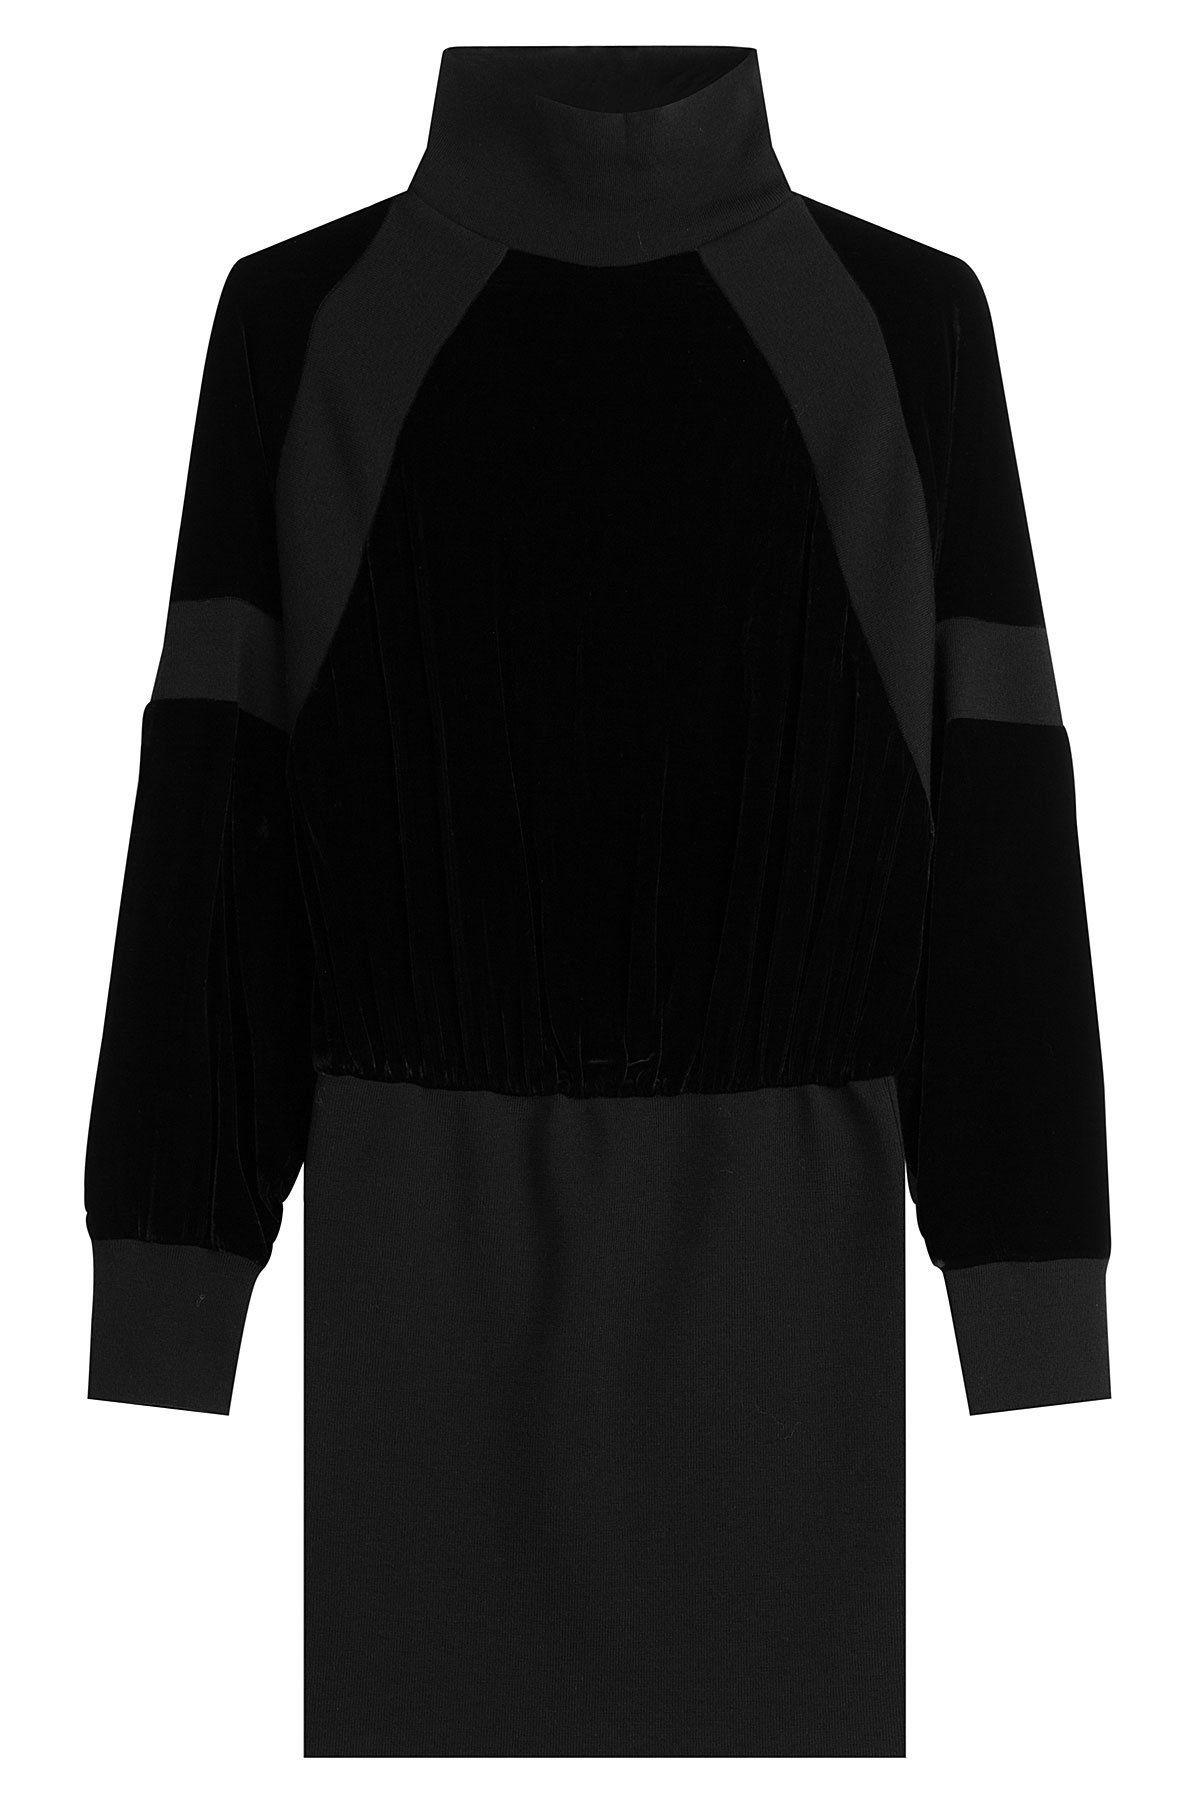 c037c70eadd DKNY - Knit Sweater Dress with Velvet